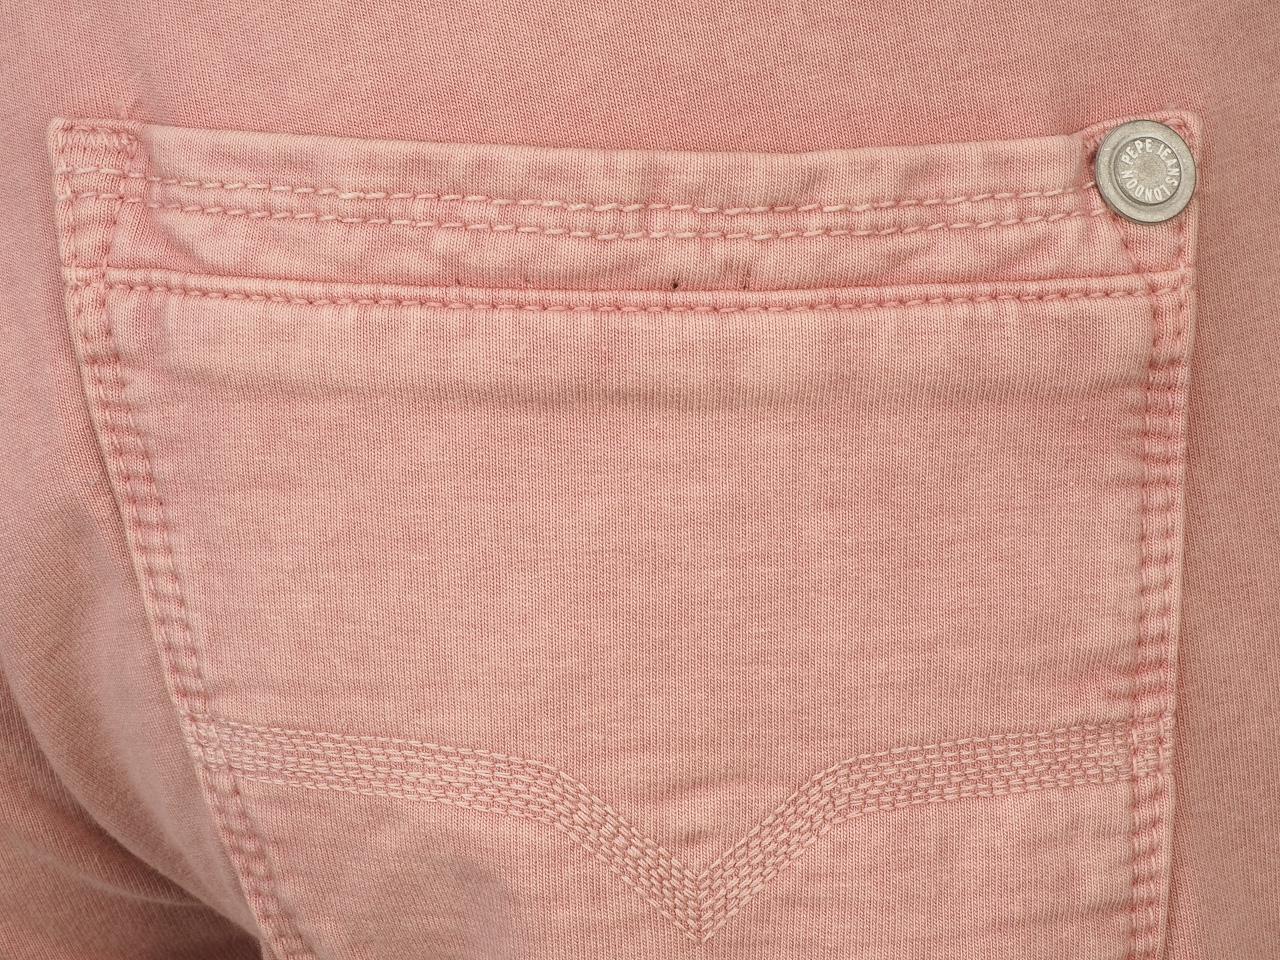 Bermuda-Shorts-Pepe-Jeans-Gene-Pink-Shorts-Jr-Pink-51544-New thumbnail 3